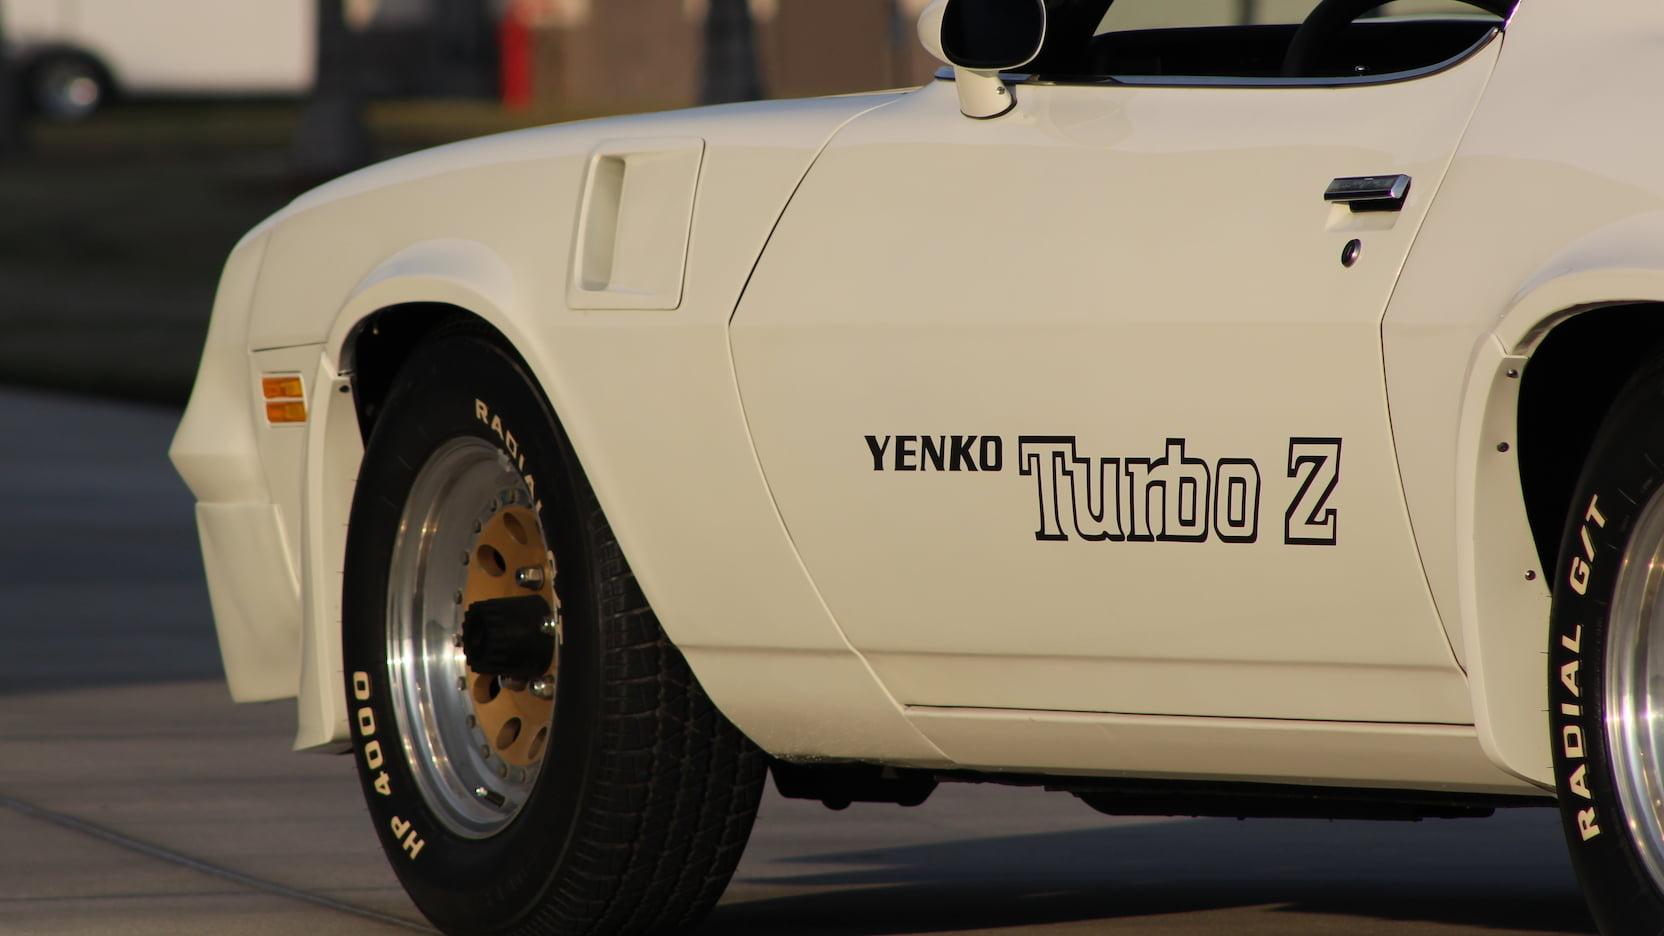 1981 Chevrolet Yenko Turbo Z side detail